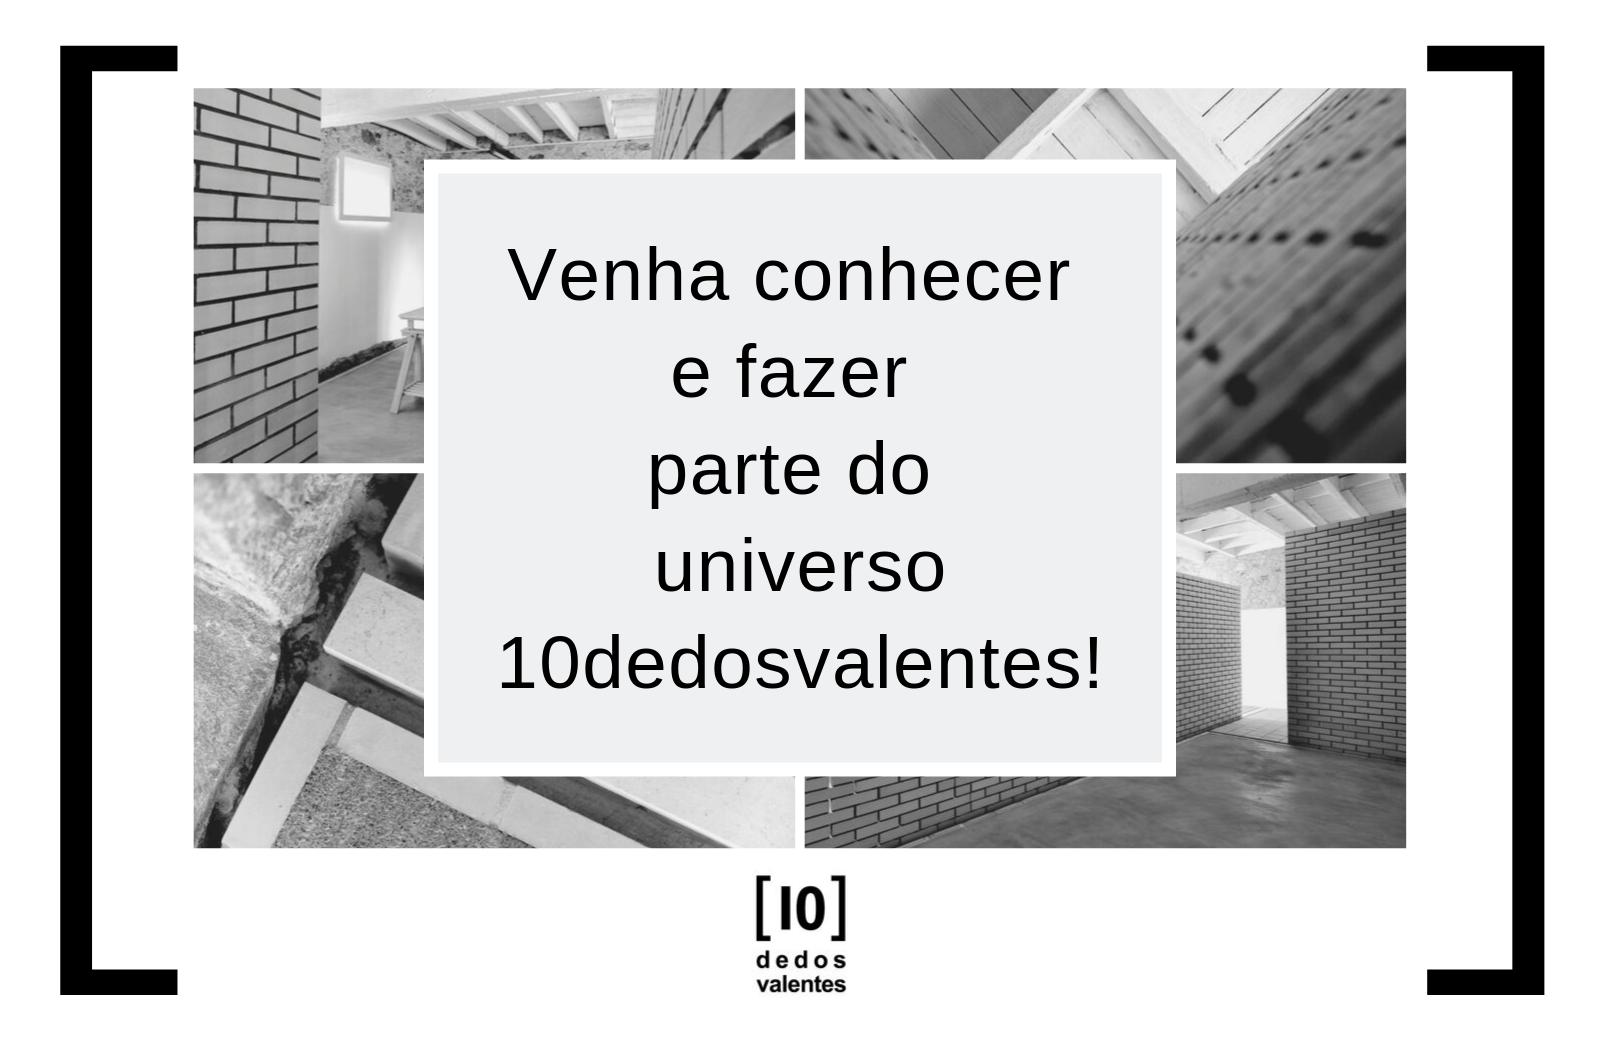 universo_10dedosvalentes